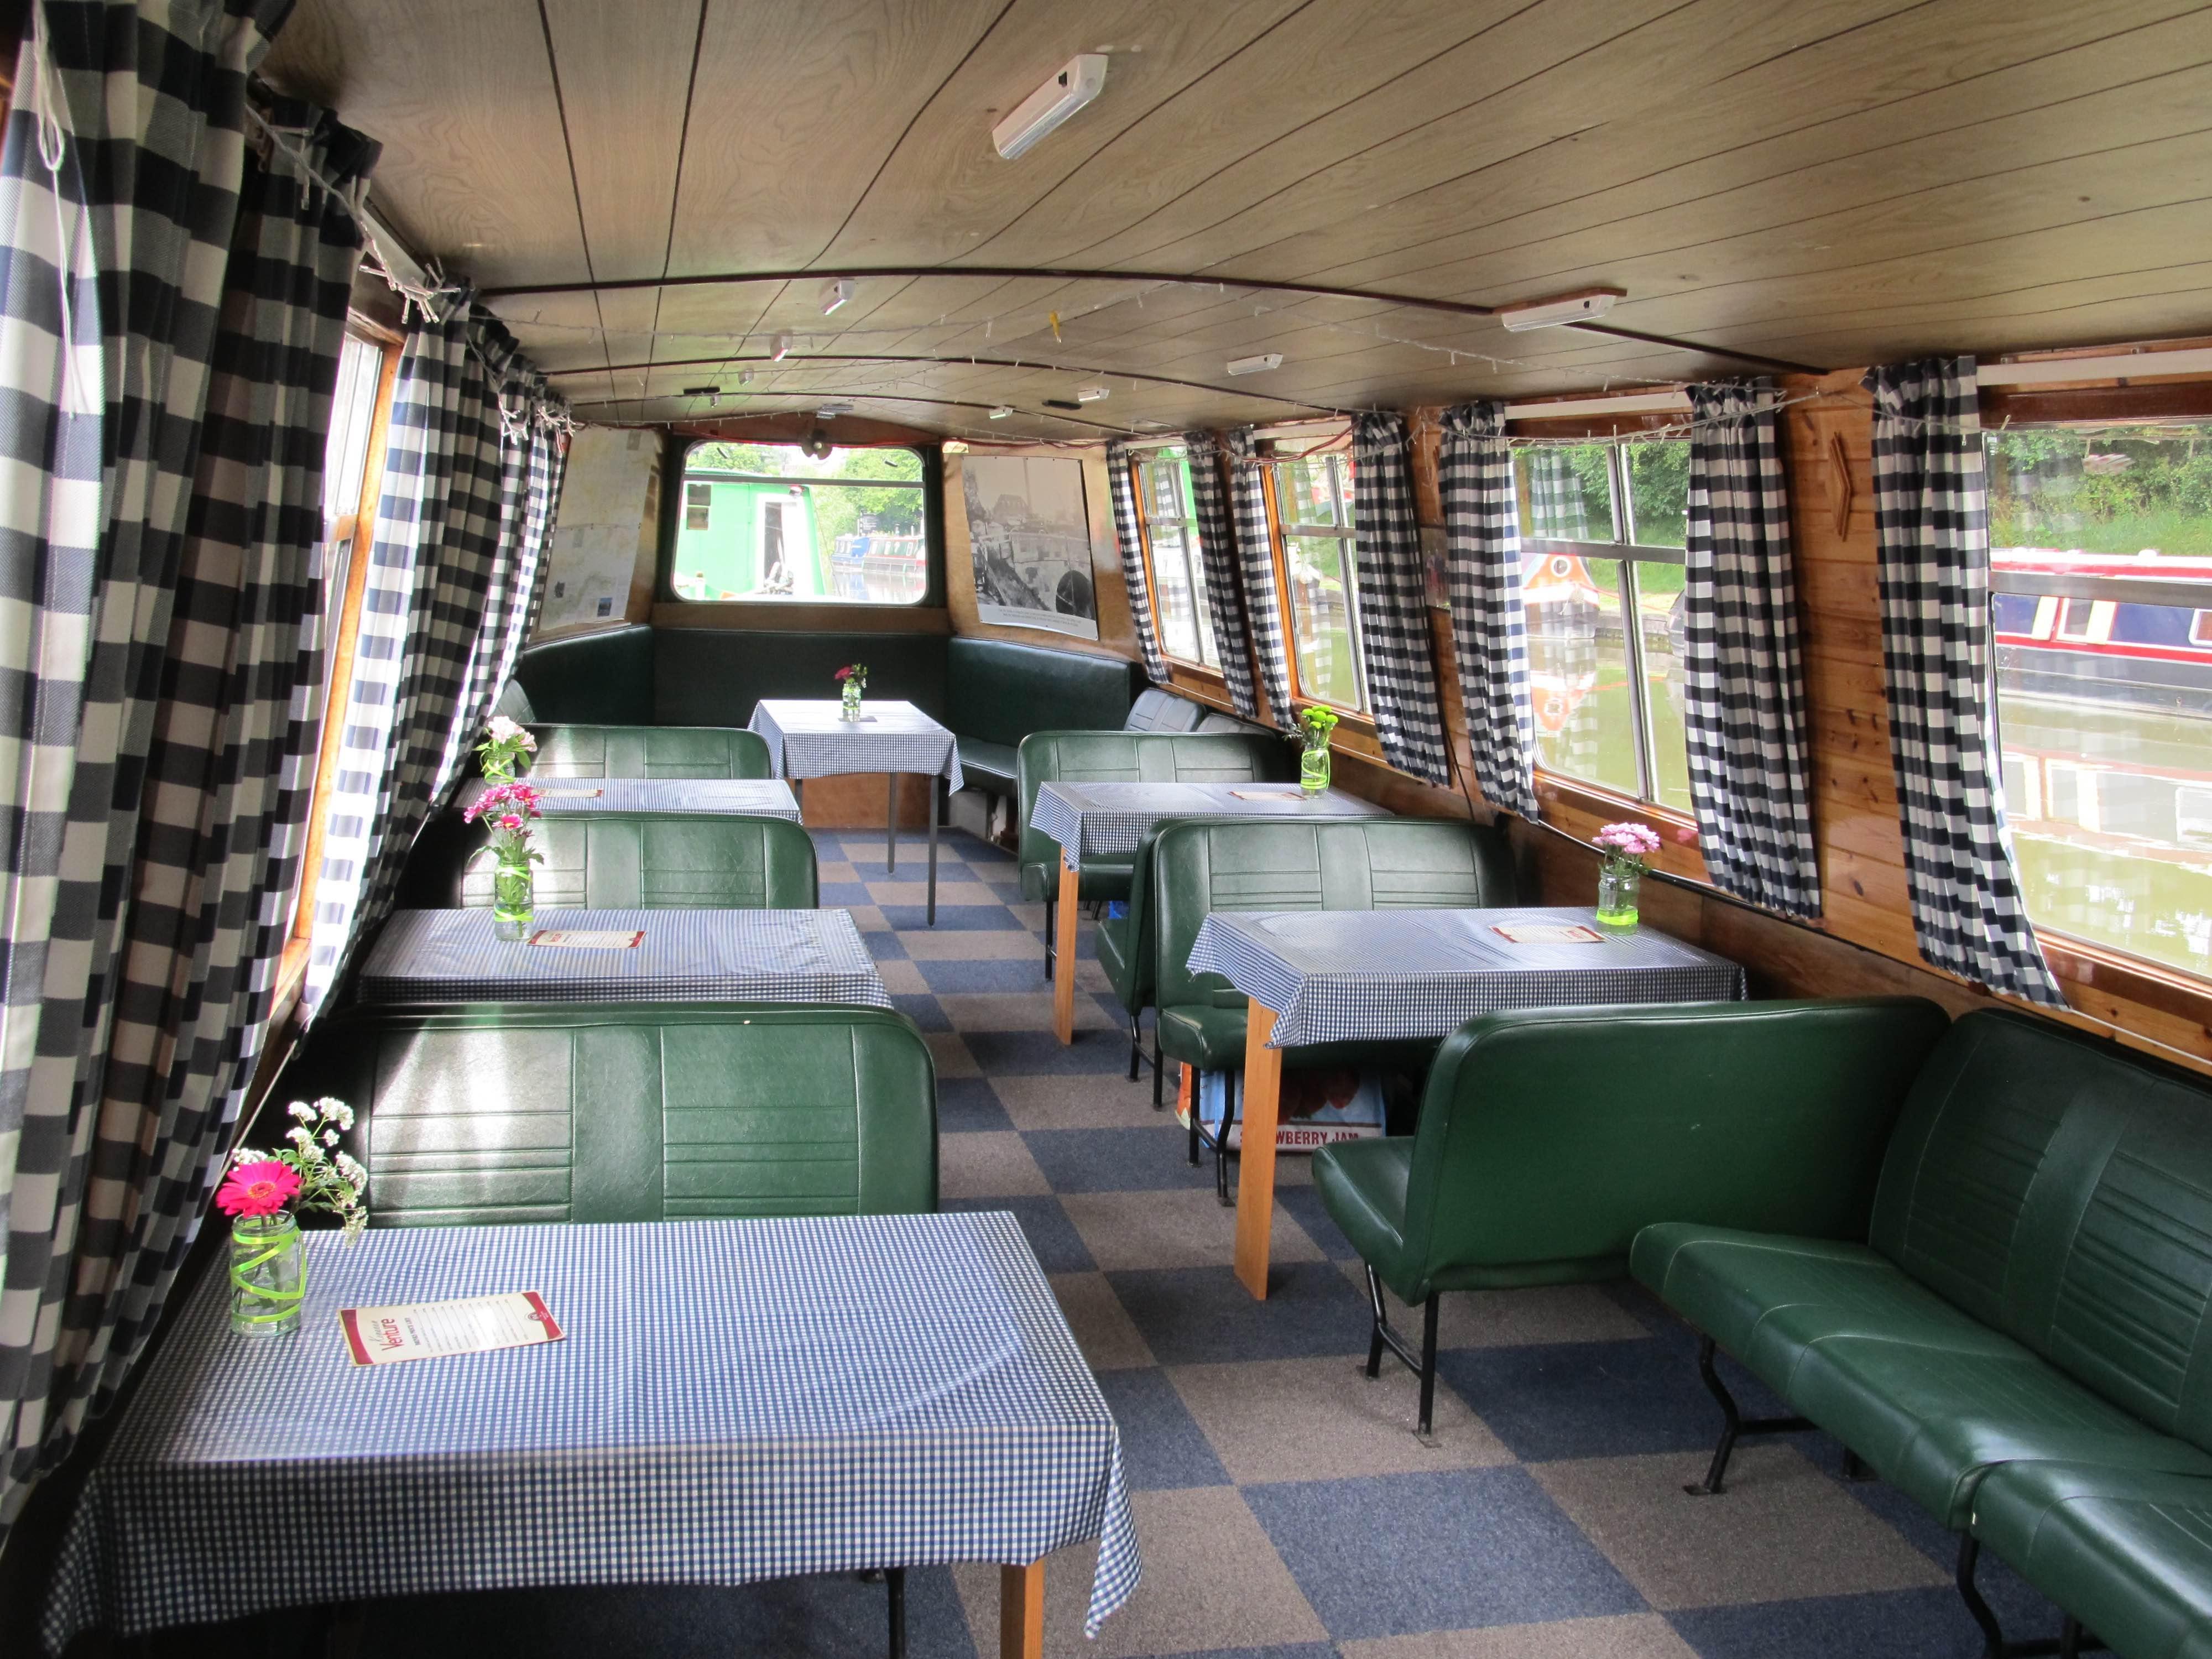 KV Inside the boat